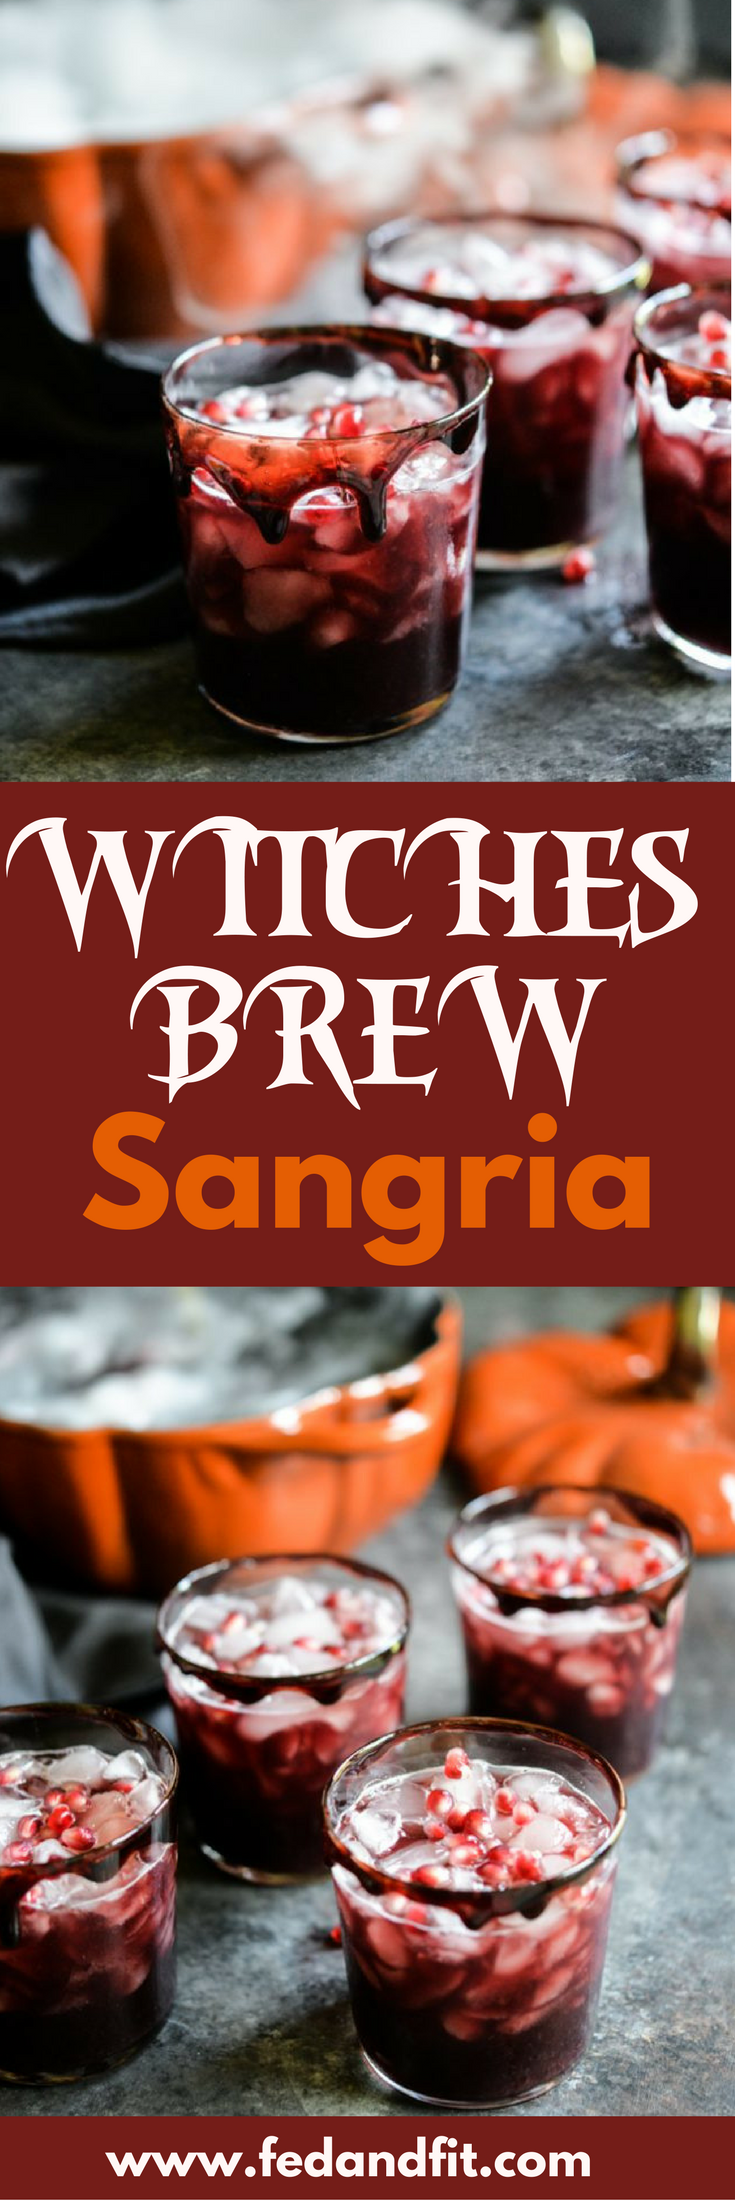 Witches' Brew Black Sangria Recipe Adult halloween